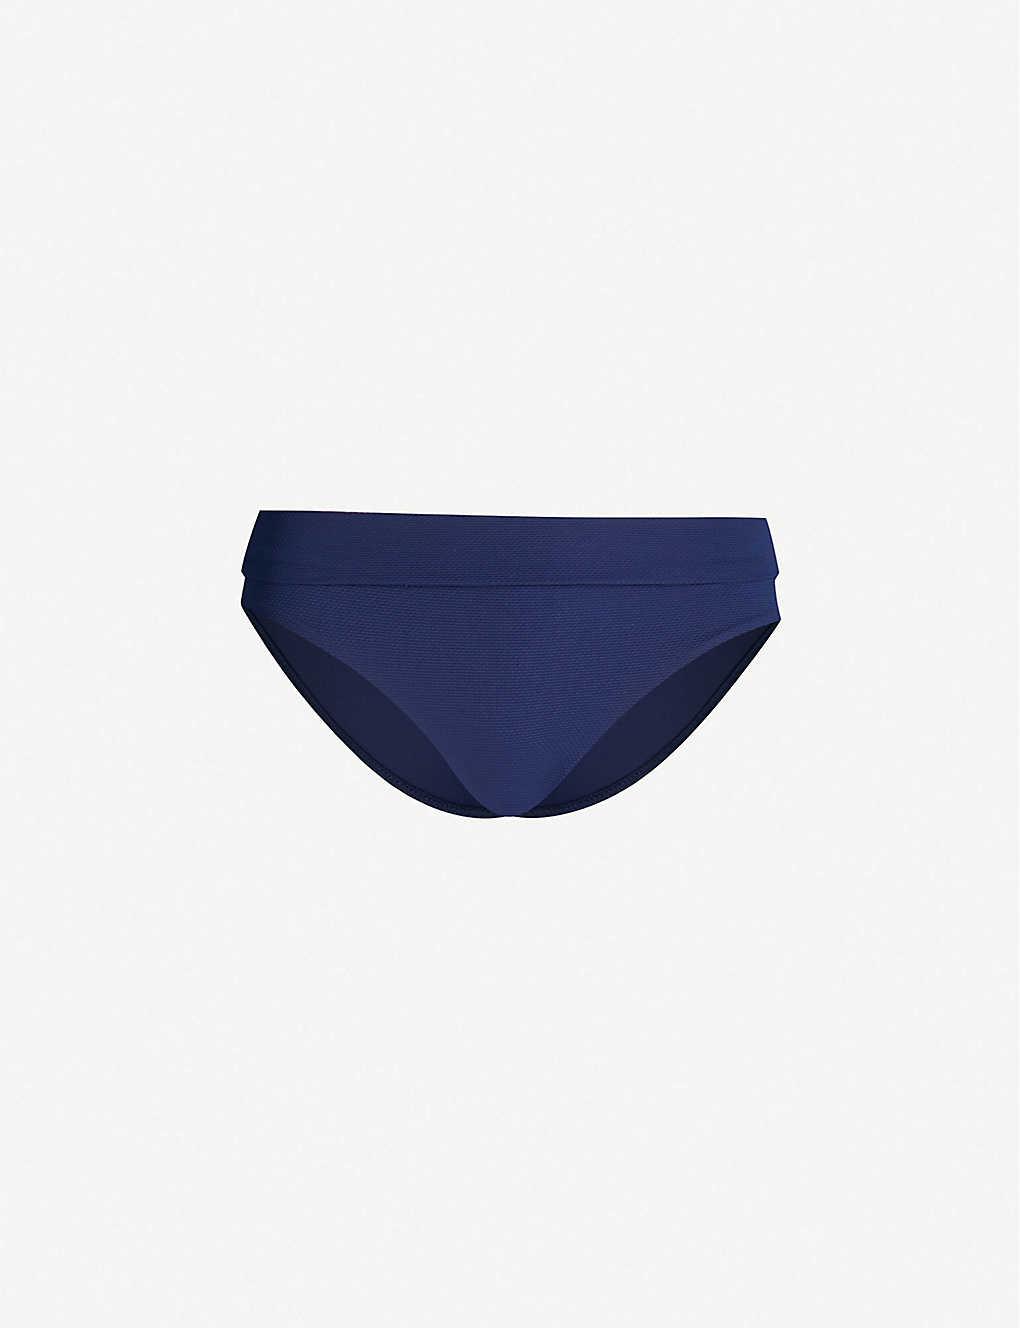 2e2bb12ae0 MELISSA ODABASH - Provence high-rise bikini bottoms | Selfridges.com